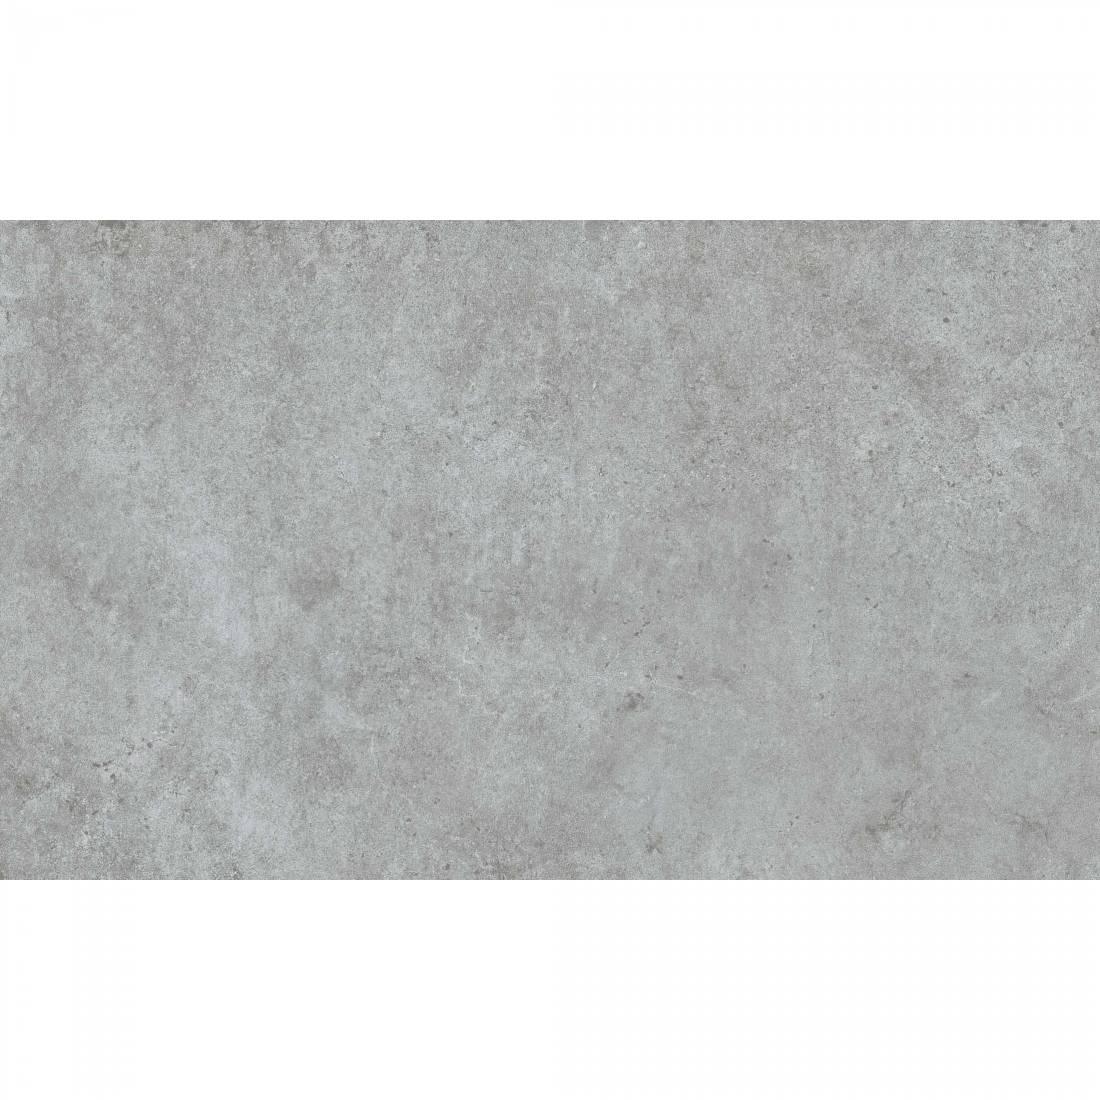 Marylebone 33.3x55 Gris Gloss 1